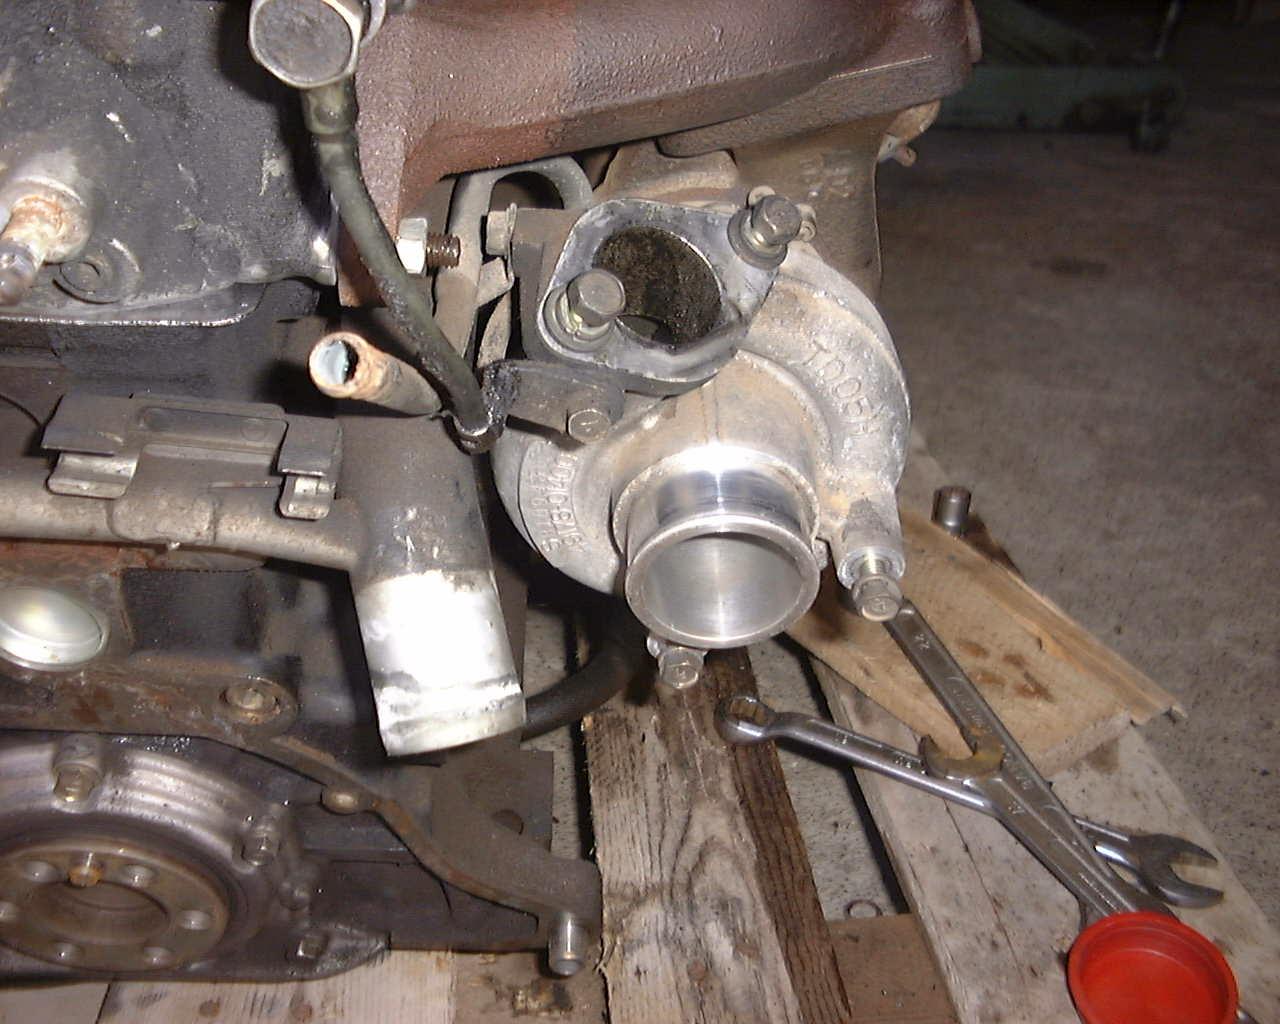 peters-turbo-defekt-1-9